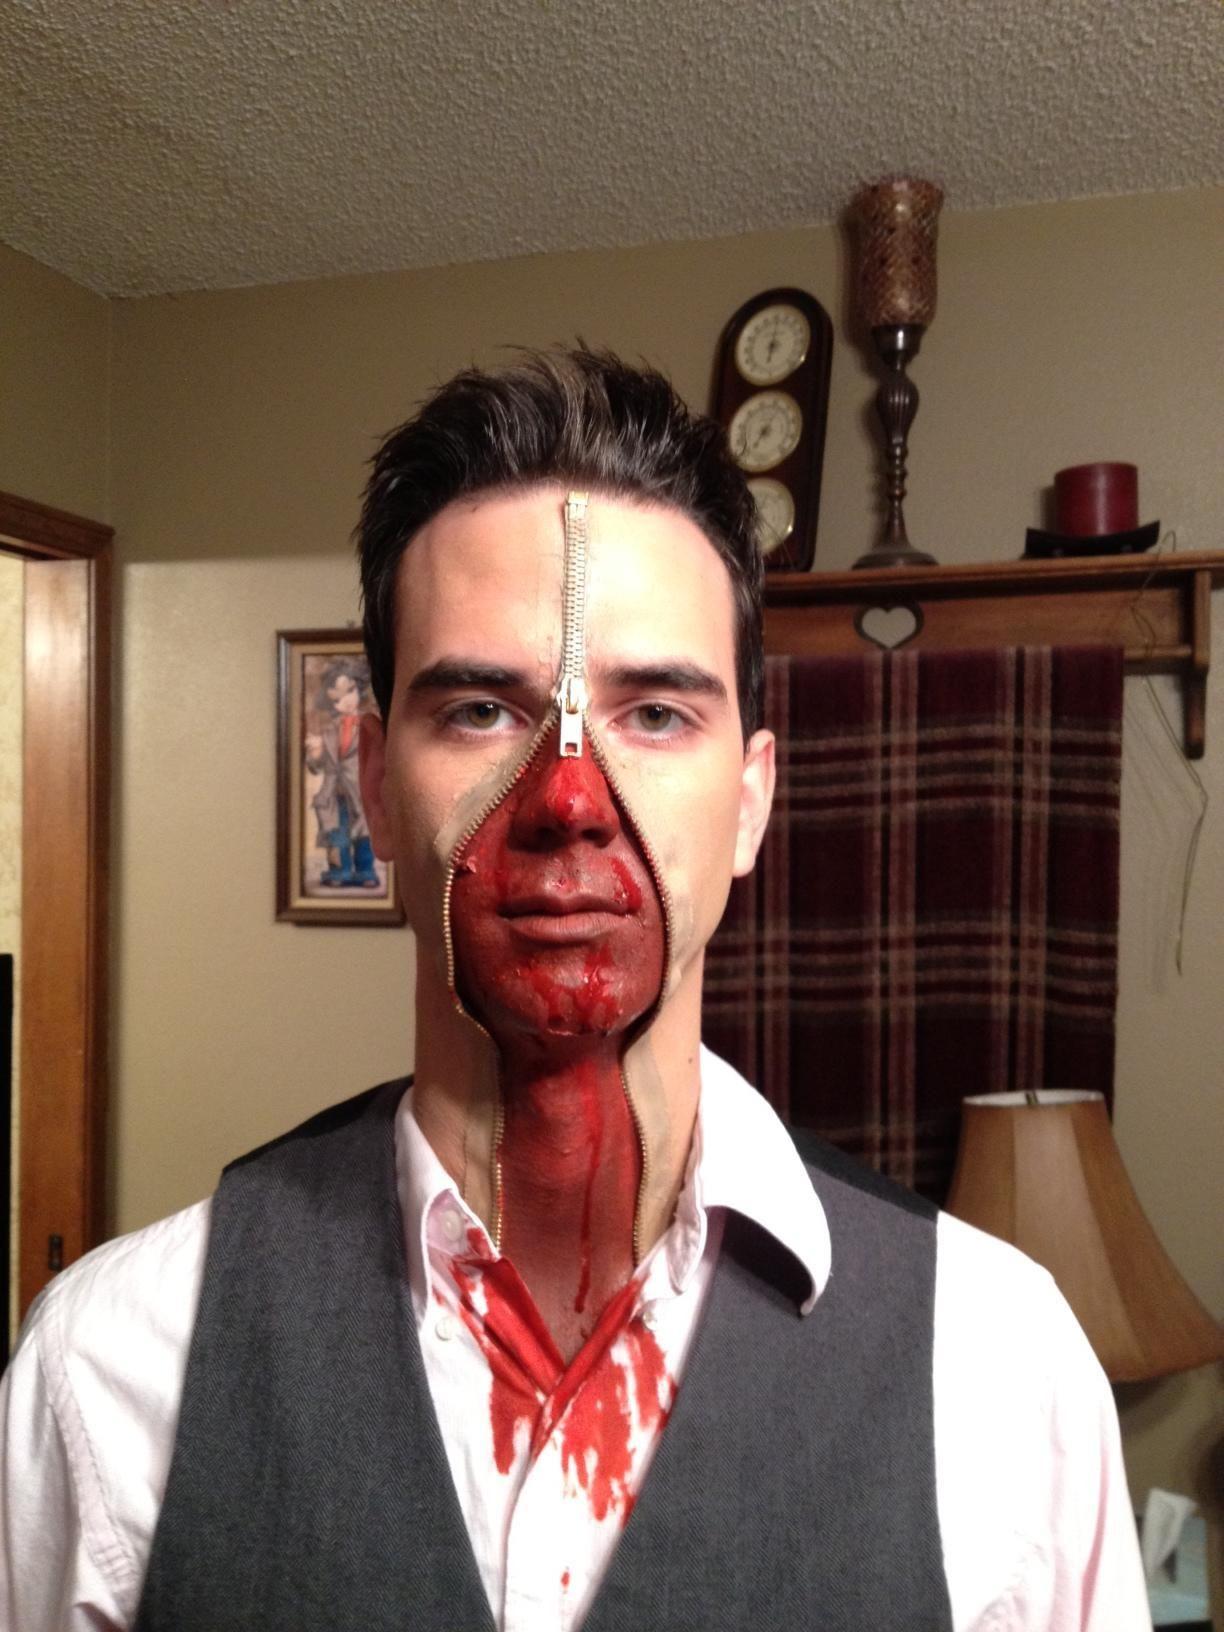 Zipper face costume  sc 1 st  Pinterest & 36 Elaborate Halloween Costumes to Make Everyone Jealous | Zipper ...